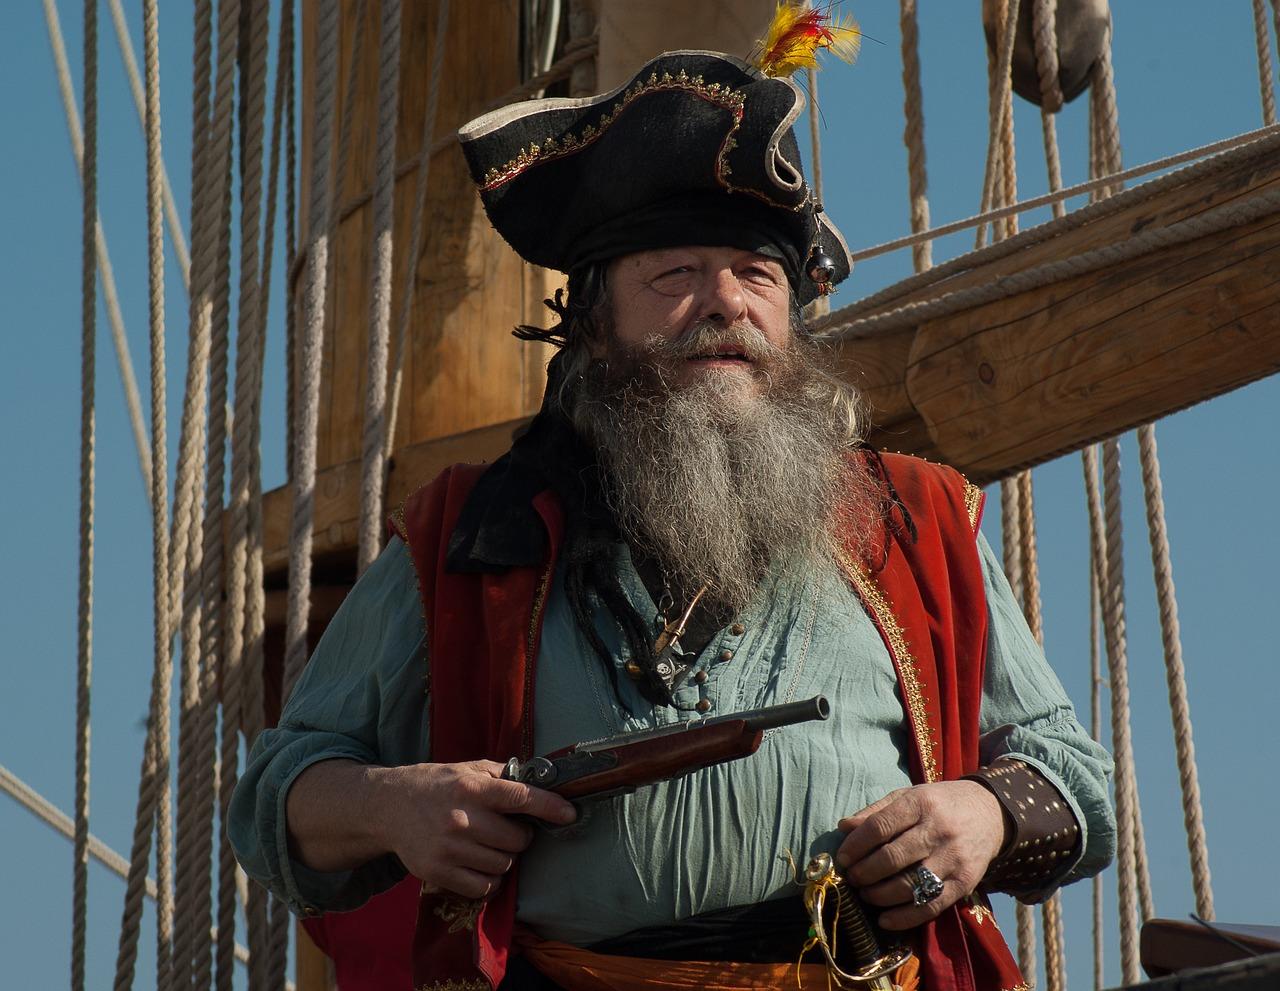 pirate costume in Cornwall